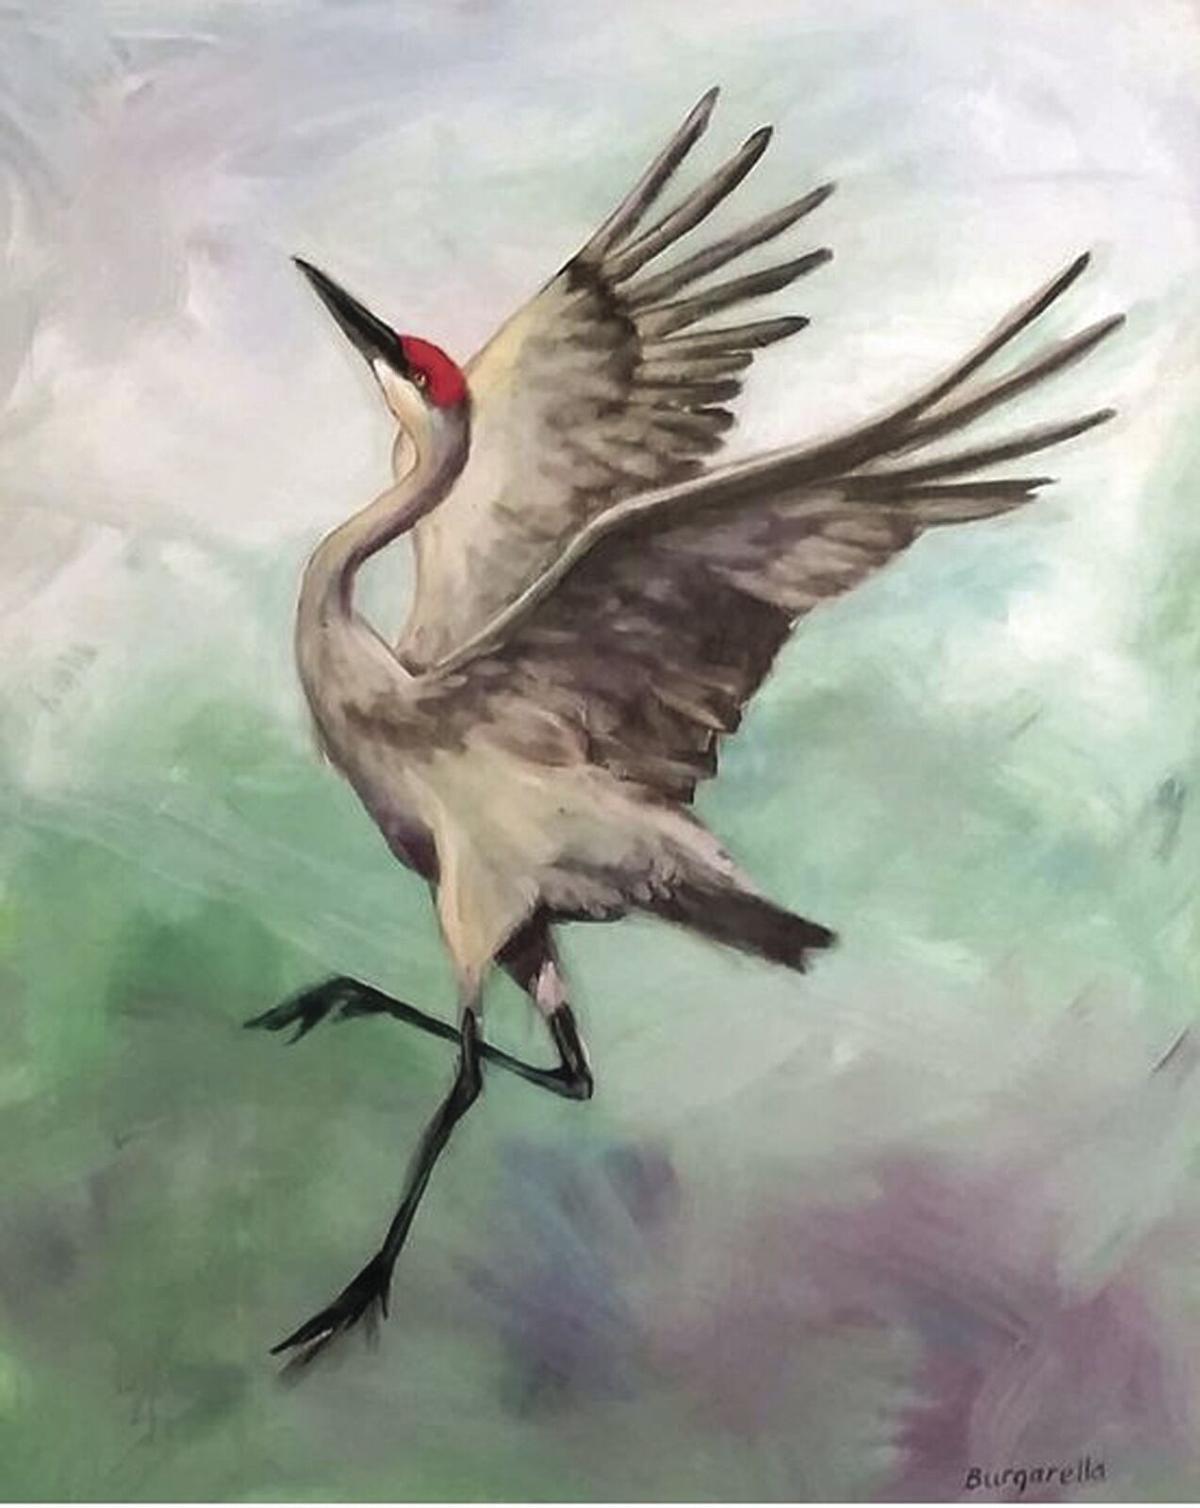 Judy Burgarella - Mating Dance of the Sandhill Crane